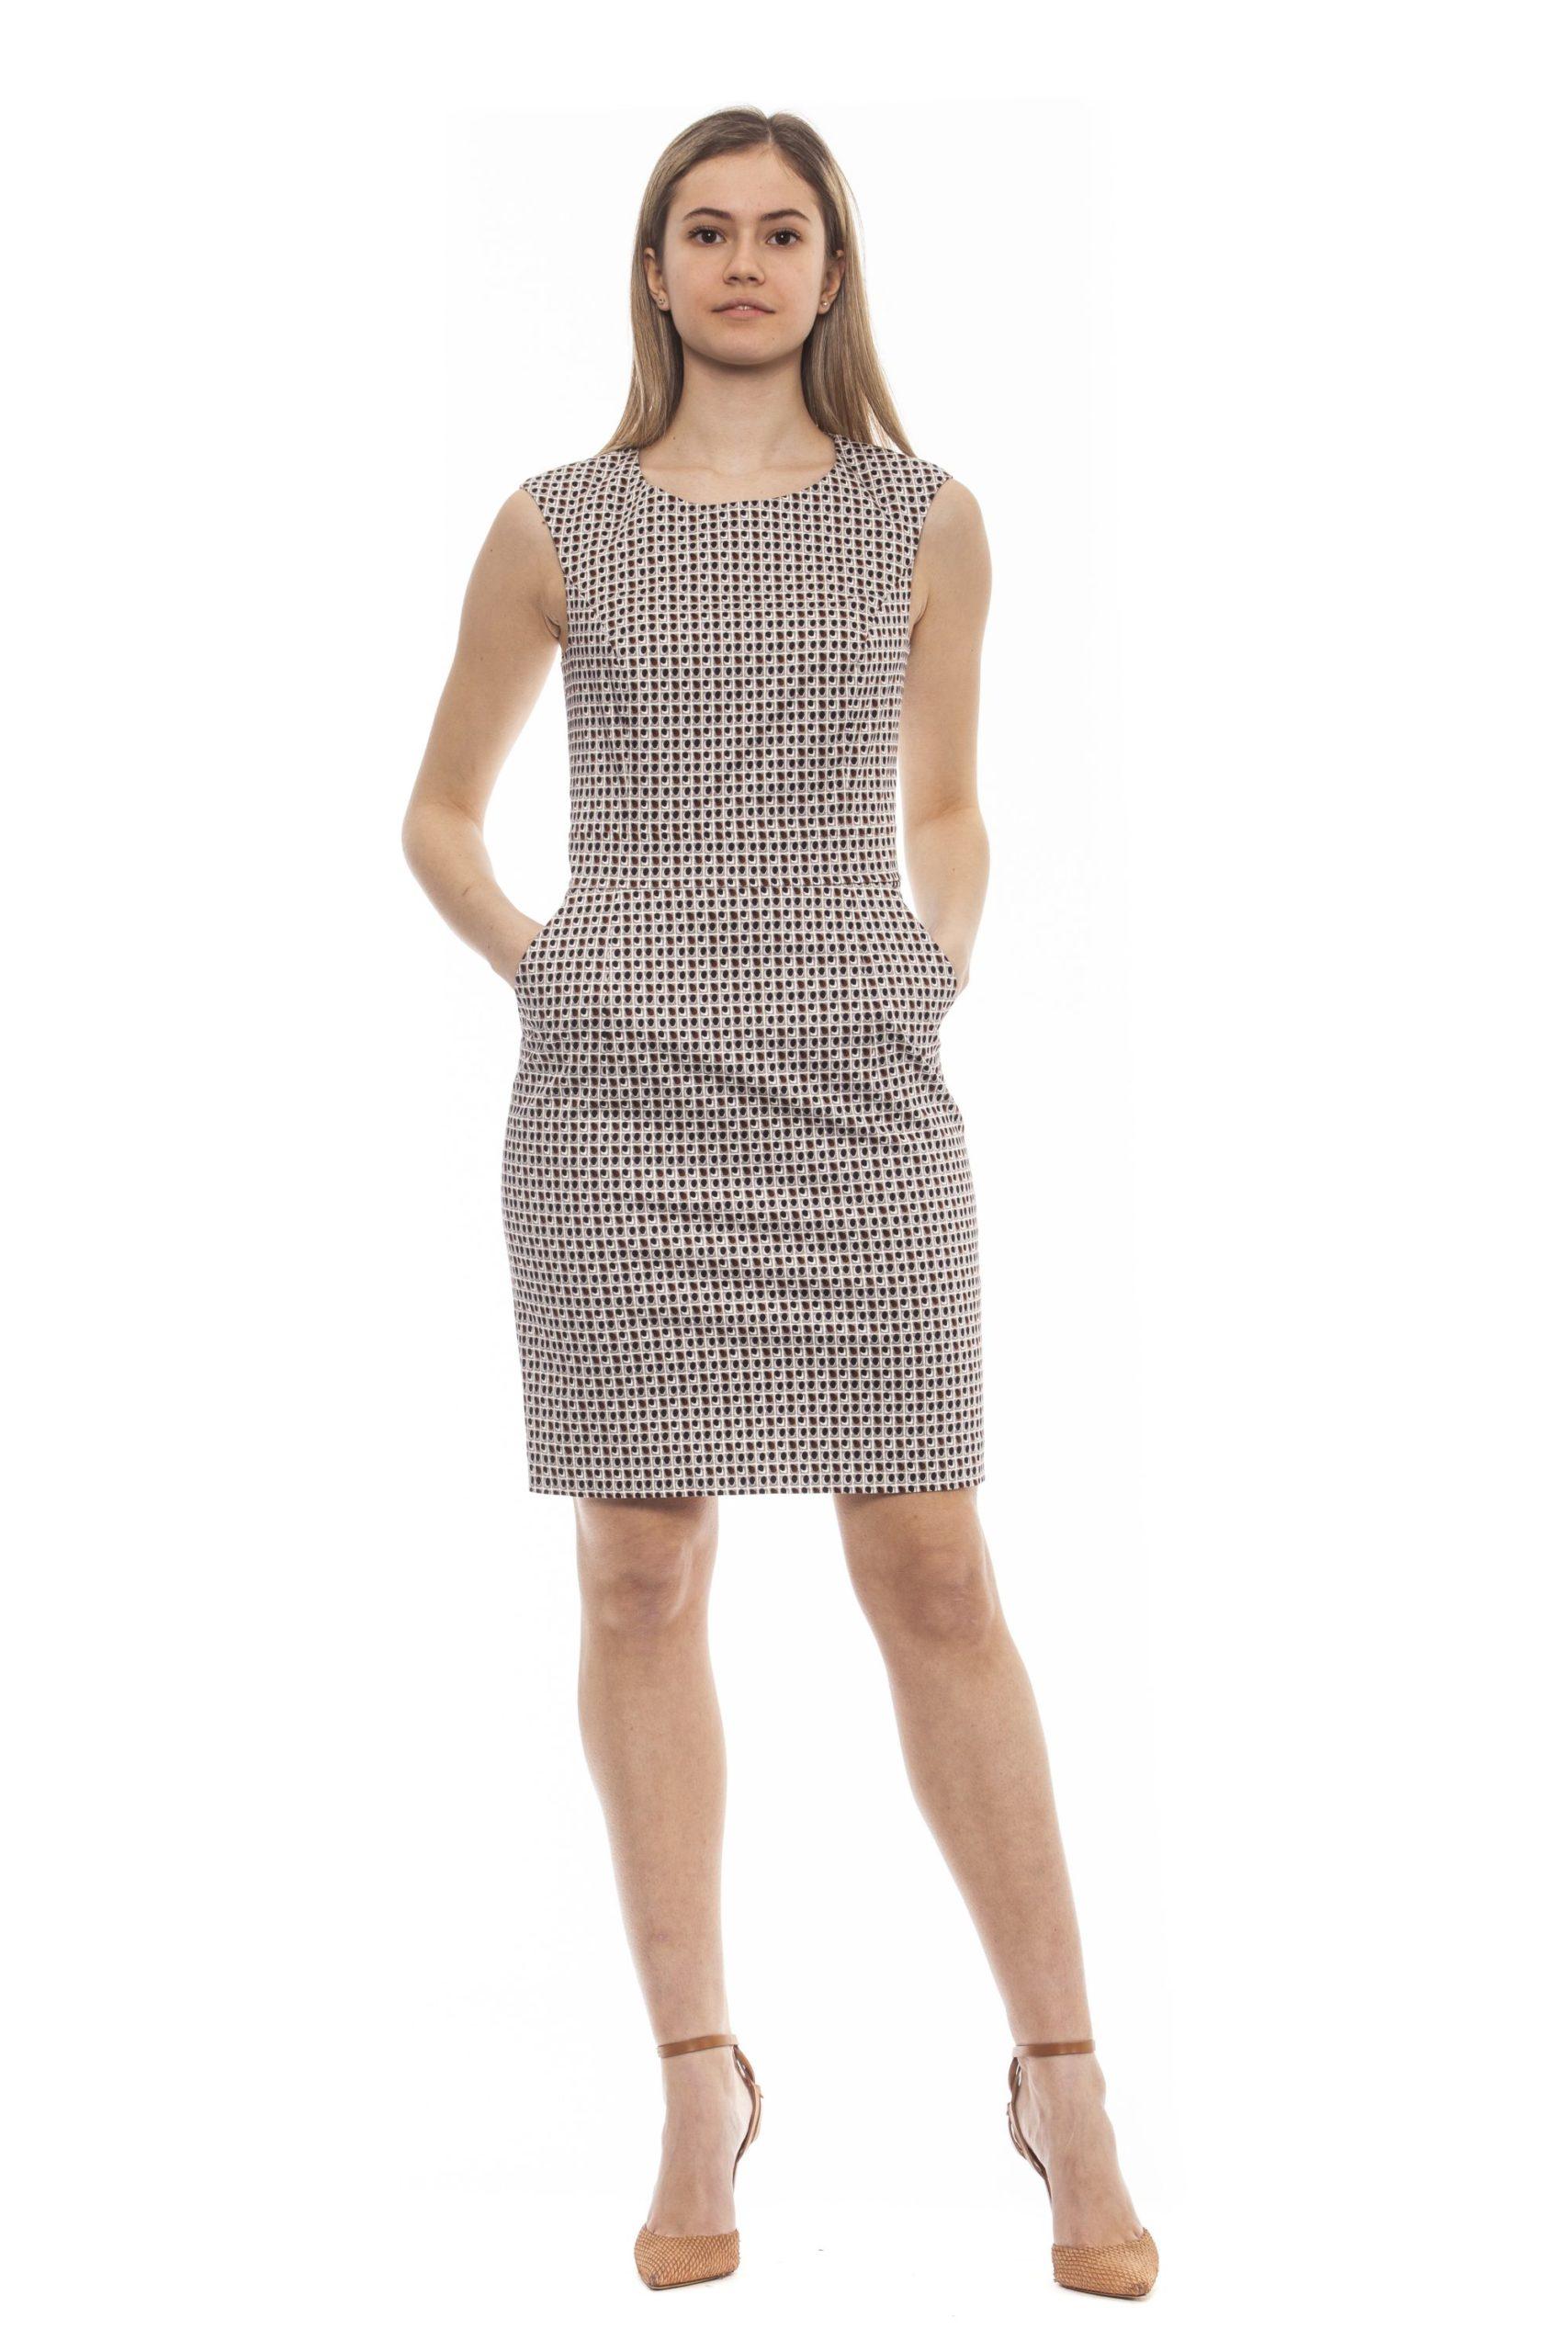 Peserico Women's Dress Multicolor PE1383146 - IT44 | M